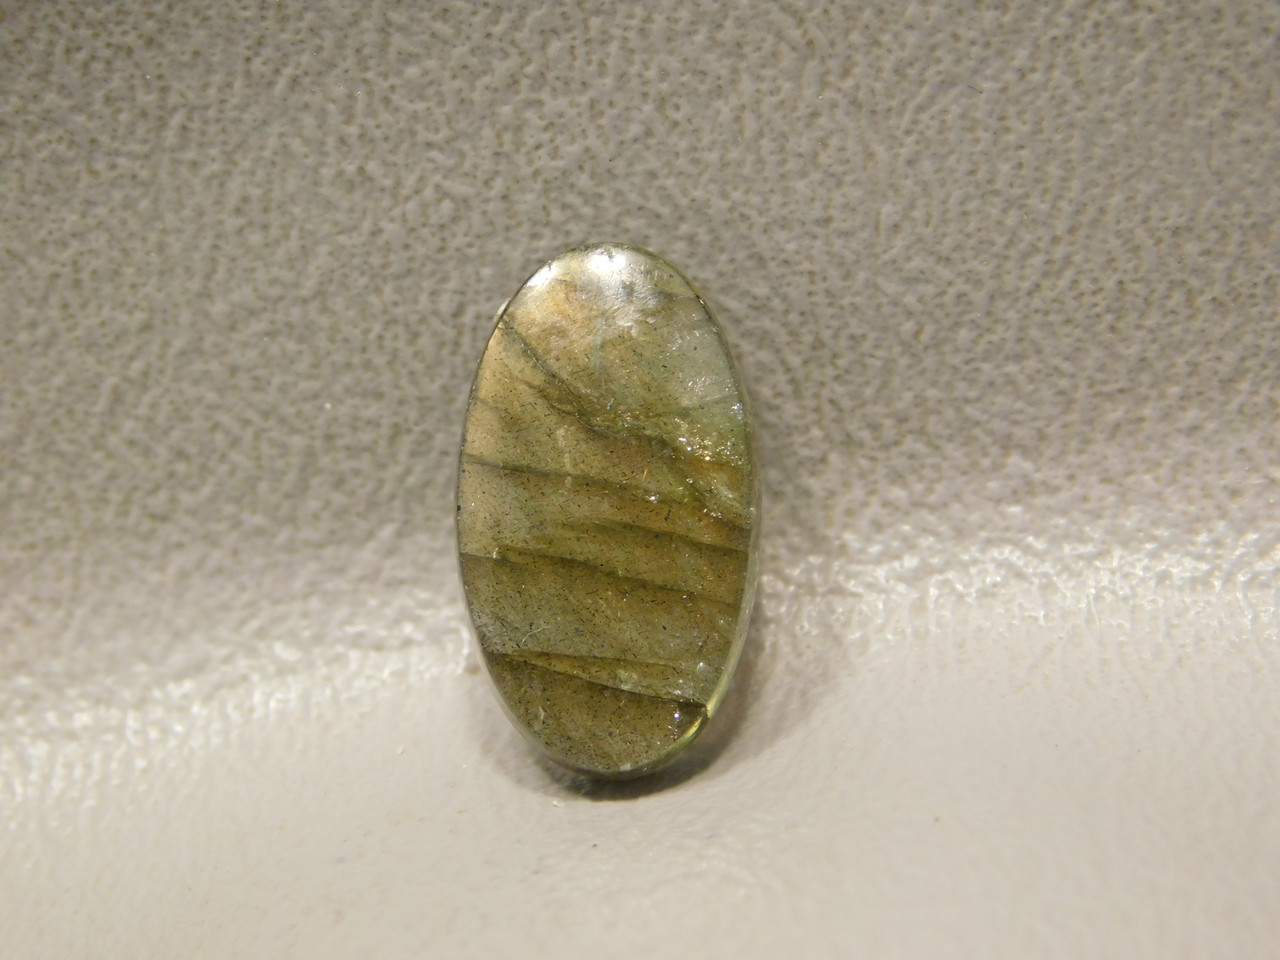 Rainbow Labradorite Cabochon Jewelry Ring Stone #21